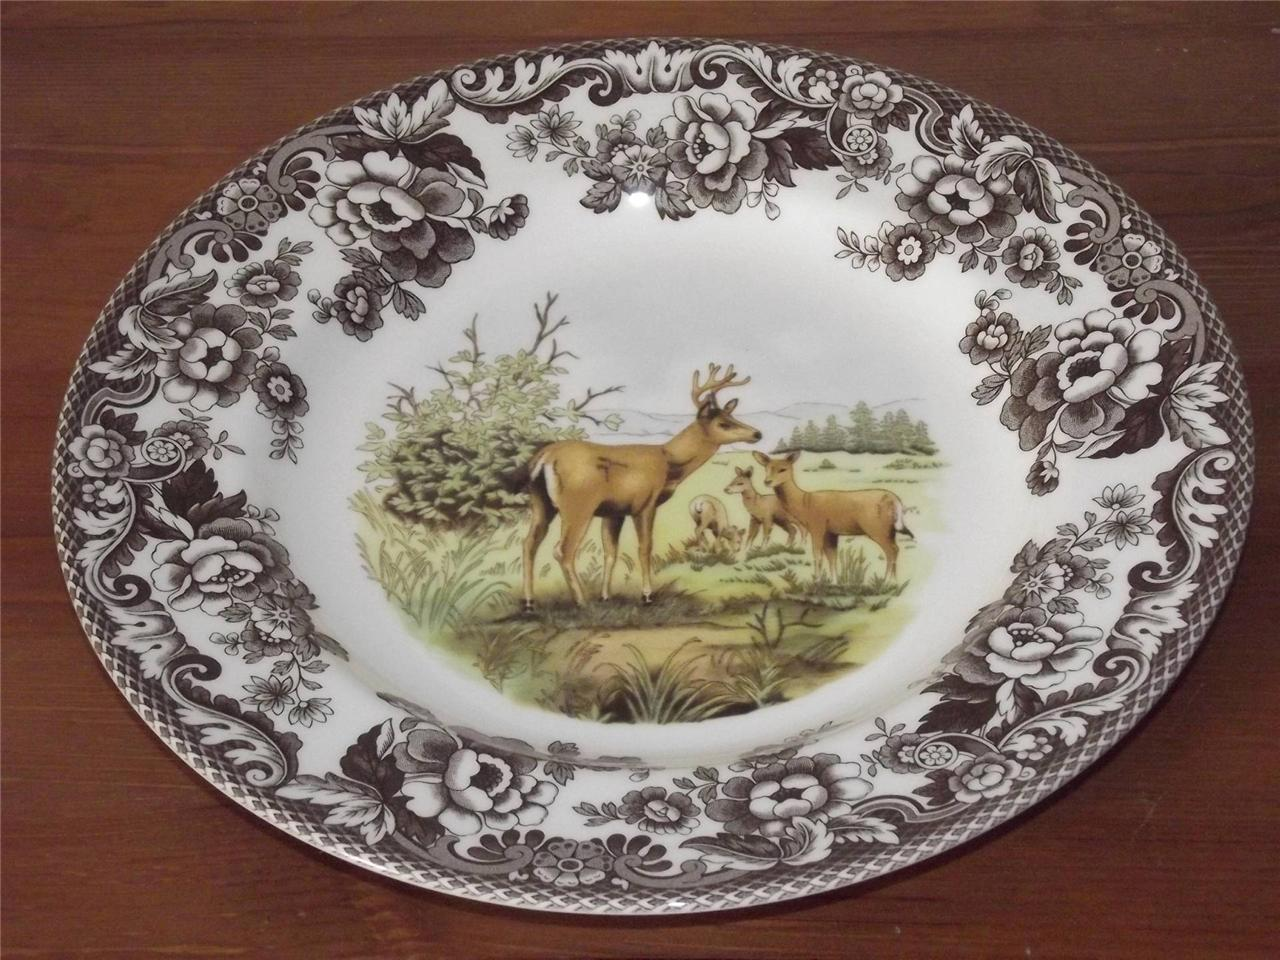 Spode Woodland 27cm Dinner Plate Mule Deer Made England & Deer Dinner Plates - Castrophotos